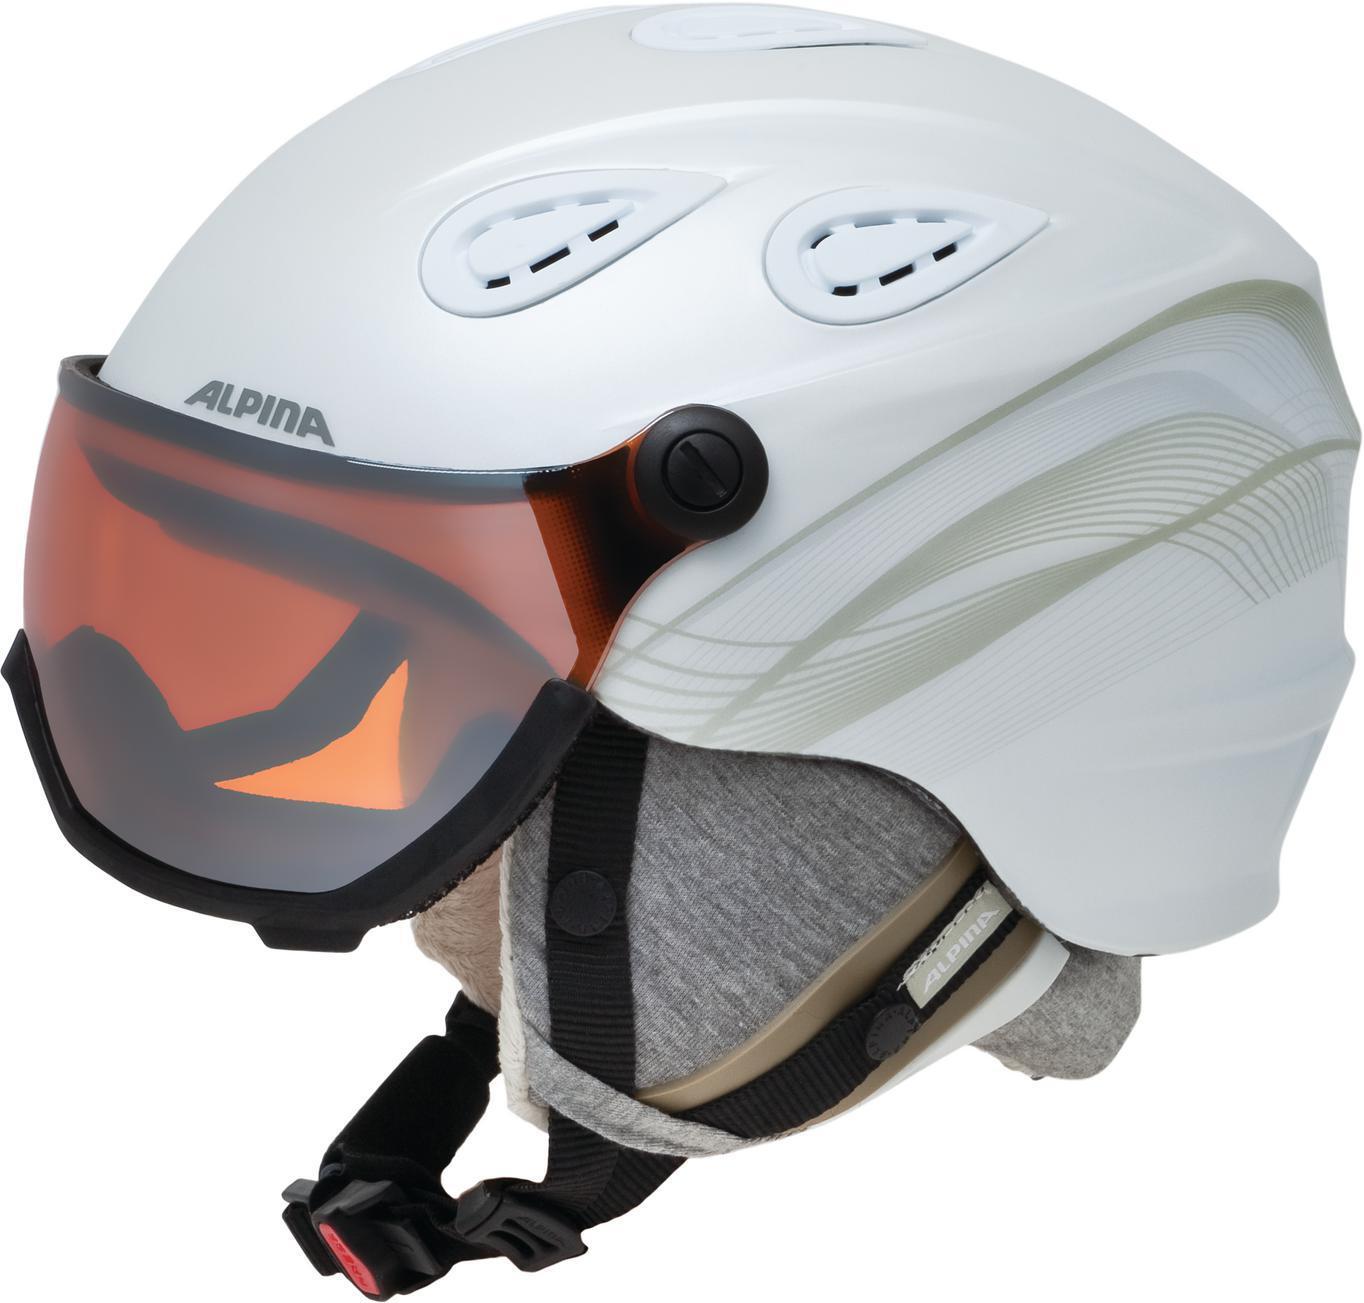 alpina-grap-visor-2-0-hm-skihelm-gr-ouml-szlig-e-54-57-cm-15-white-prosecco-matt-